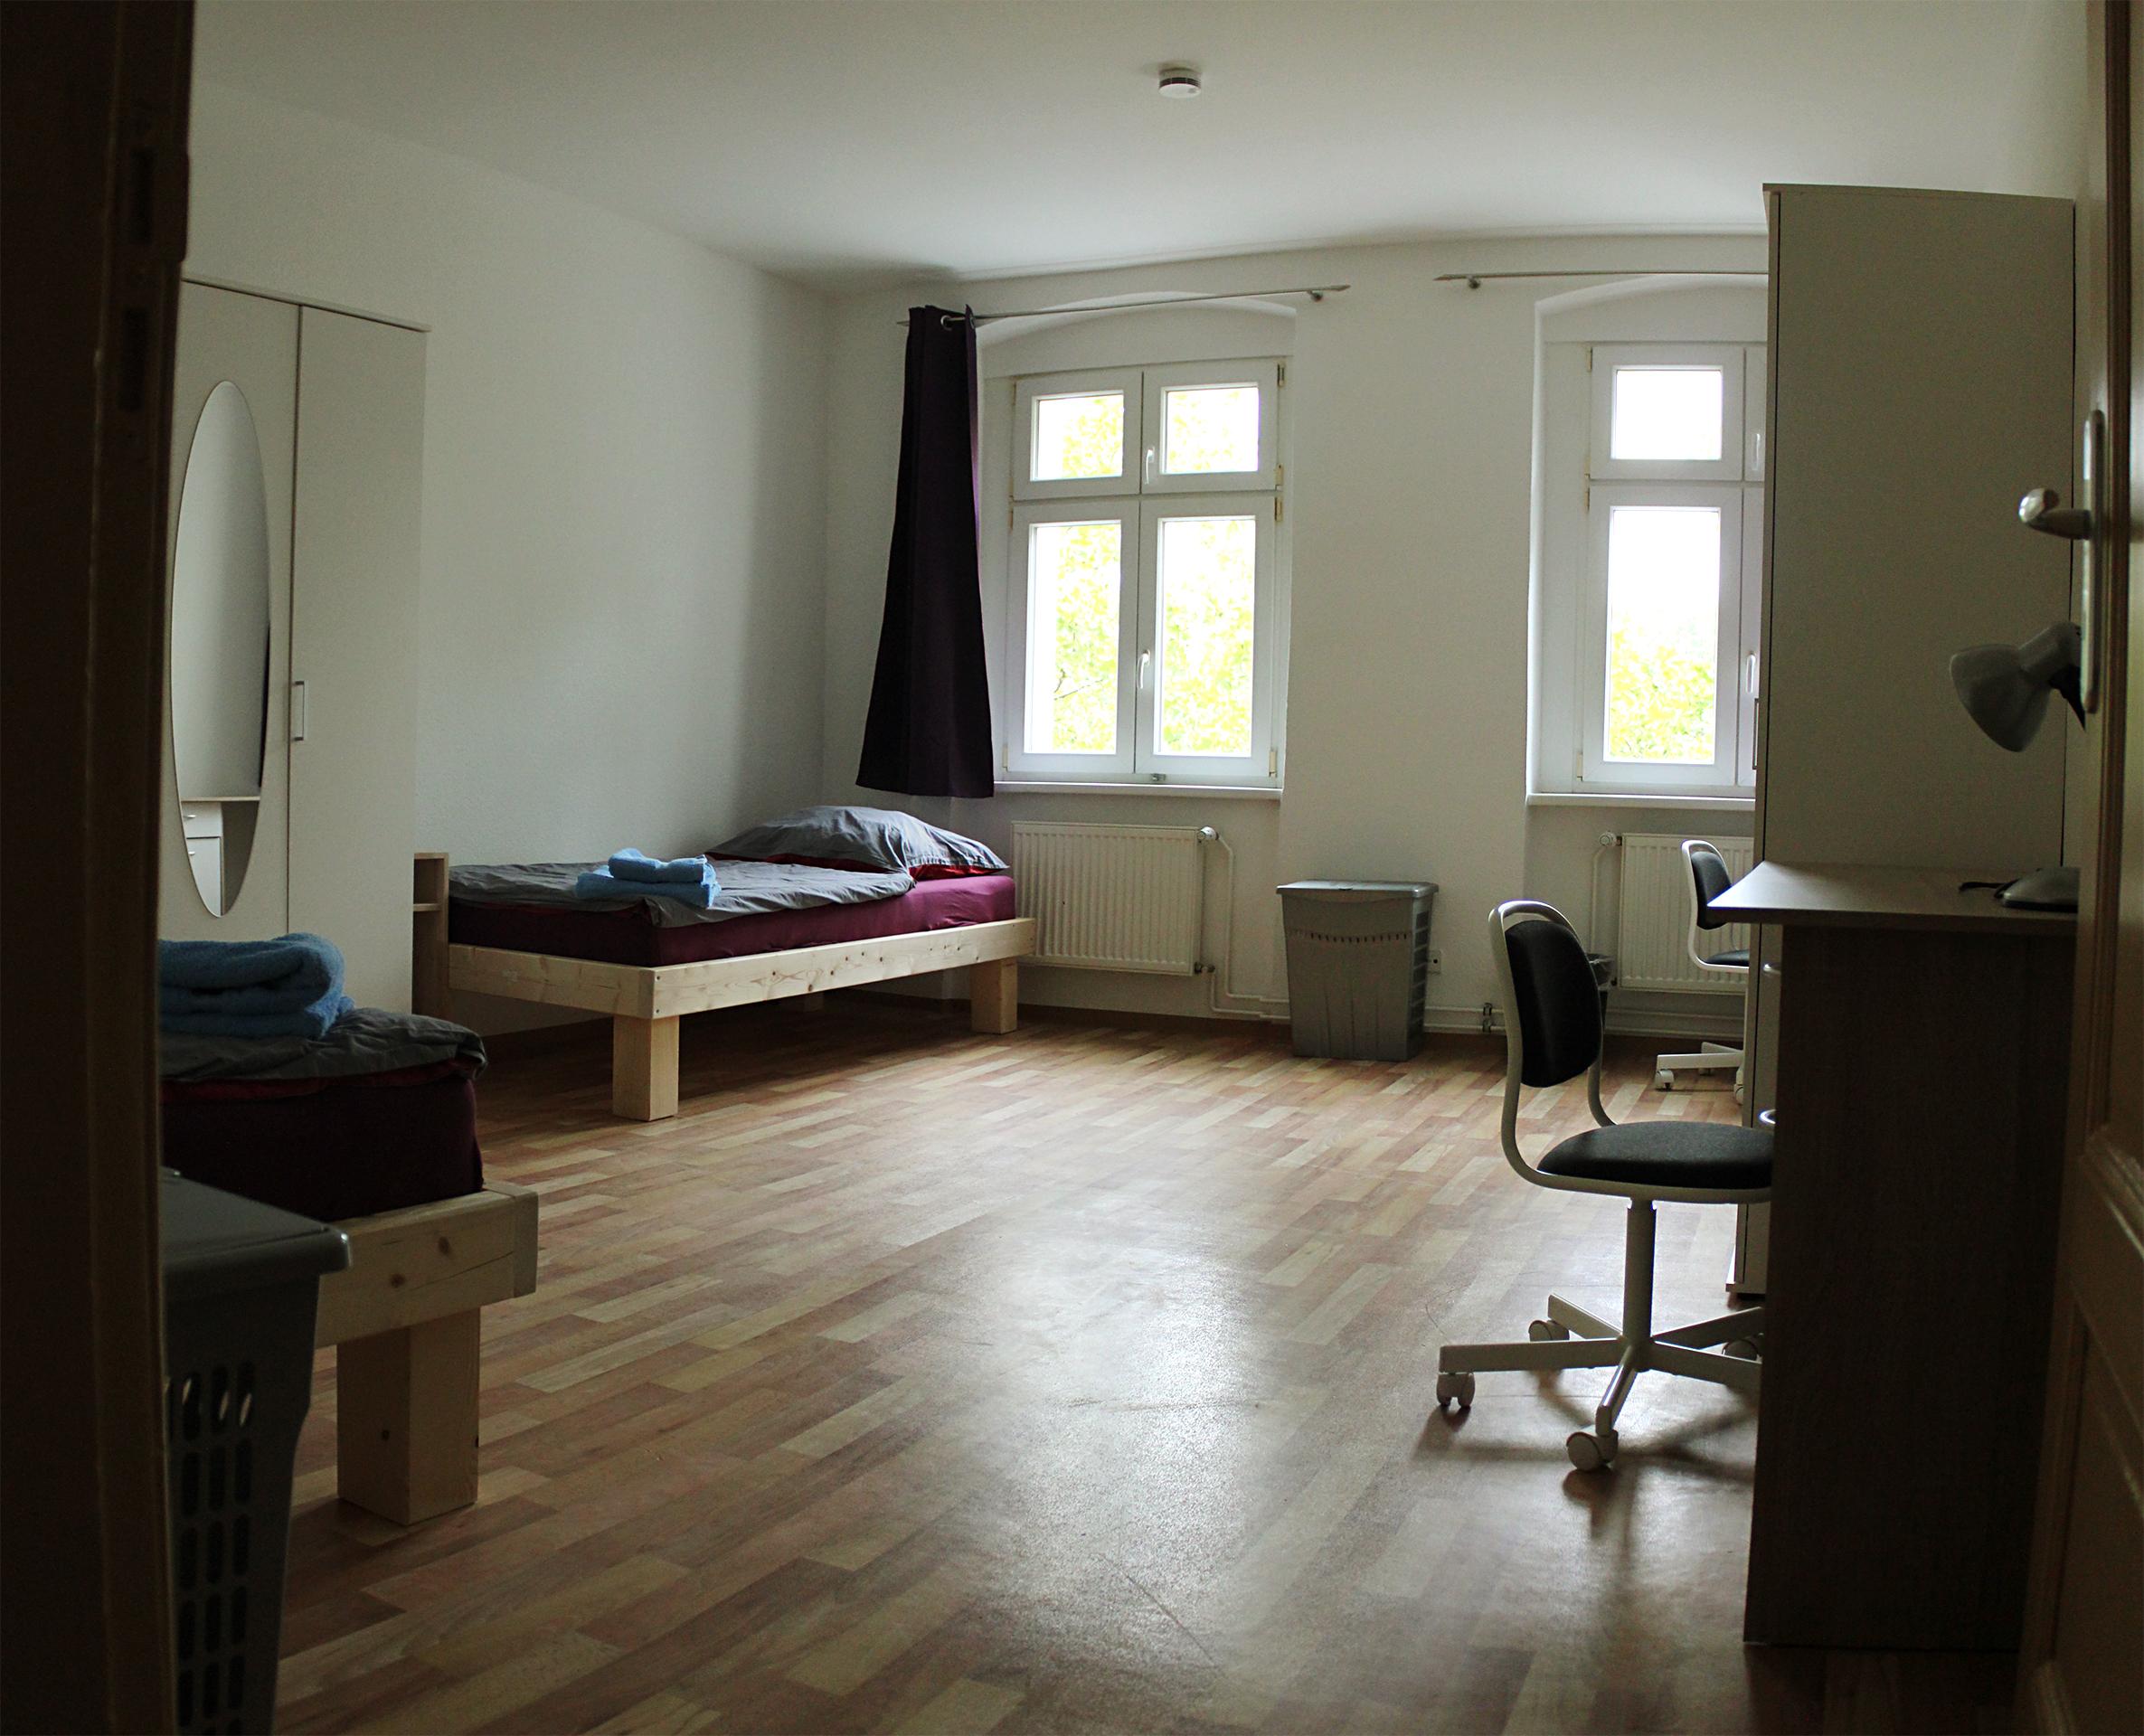 Zimmer in der Kinder- und Jugendwohngruppe OHV, navitas gGmbH